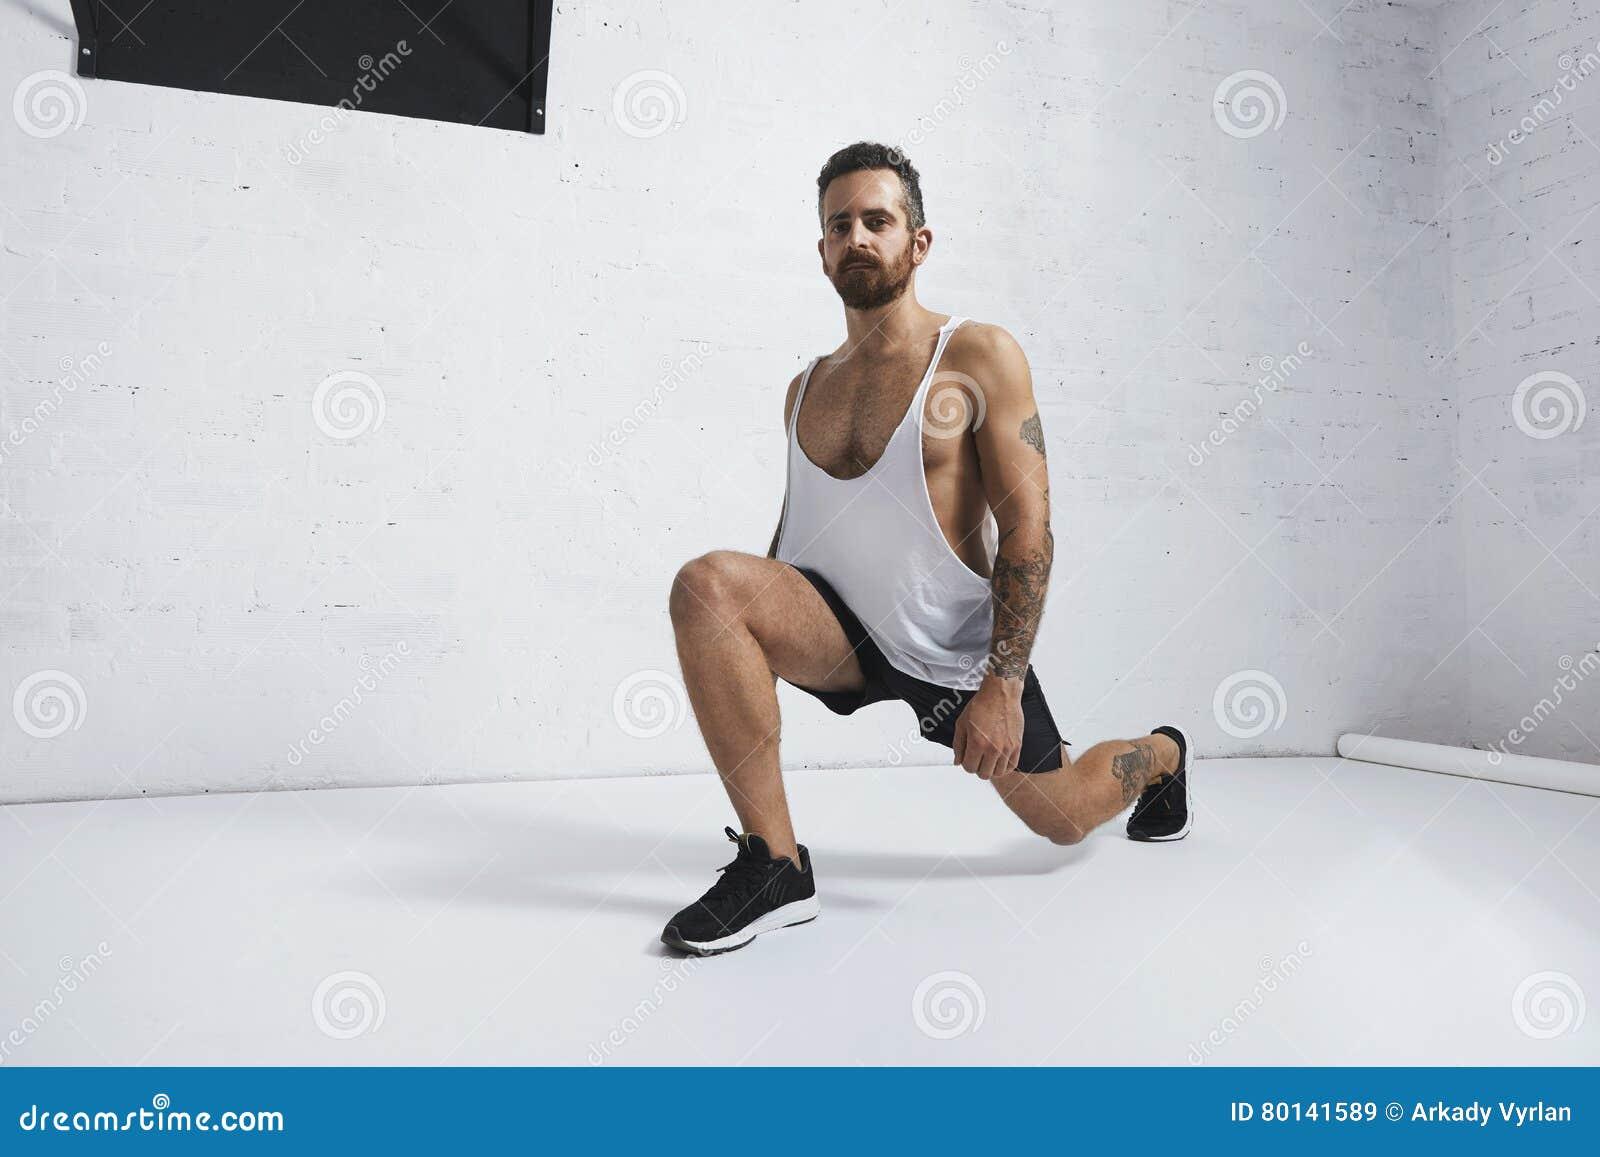 Calisthenic And Bodyweight Exercises Stock Image - Image of